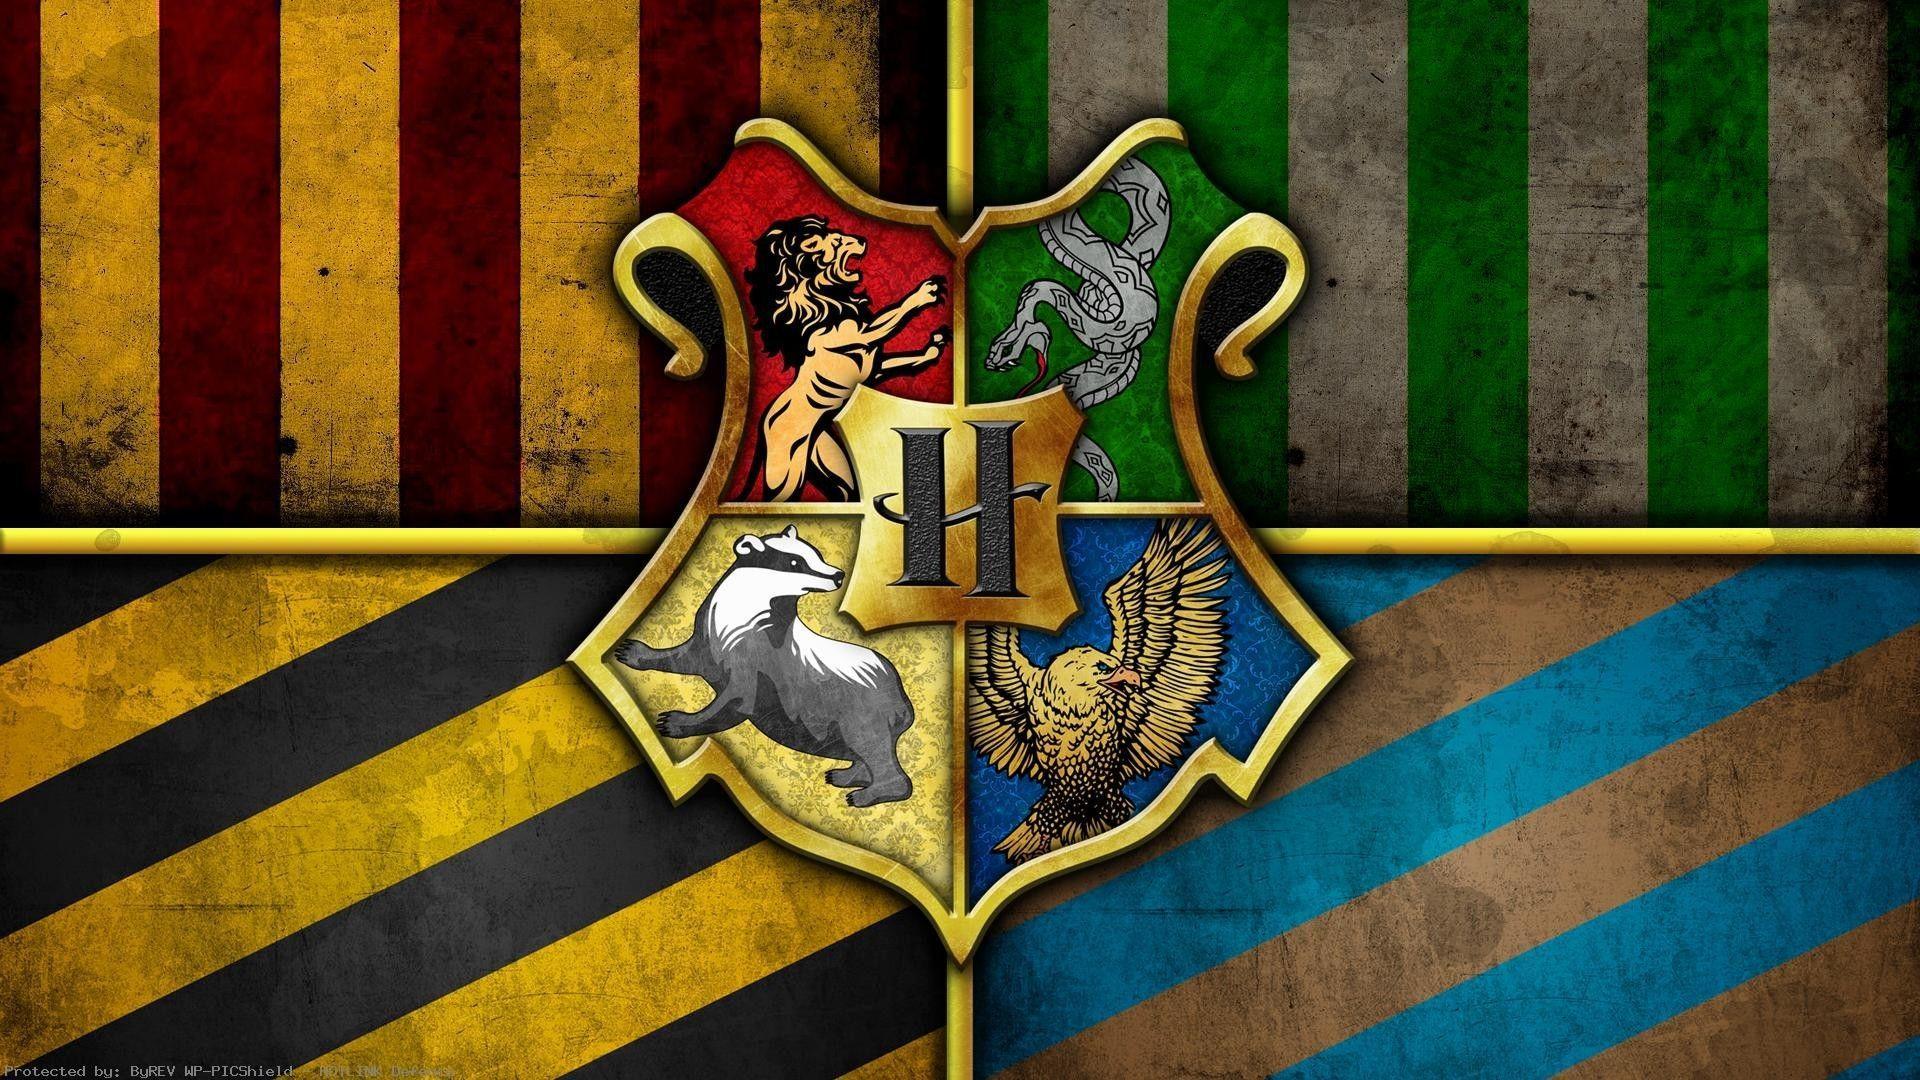 Hogwarts Logo Wallpapers Top Free Hogwarts Logo Backgrounds